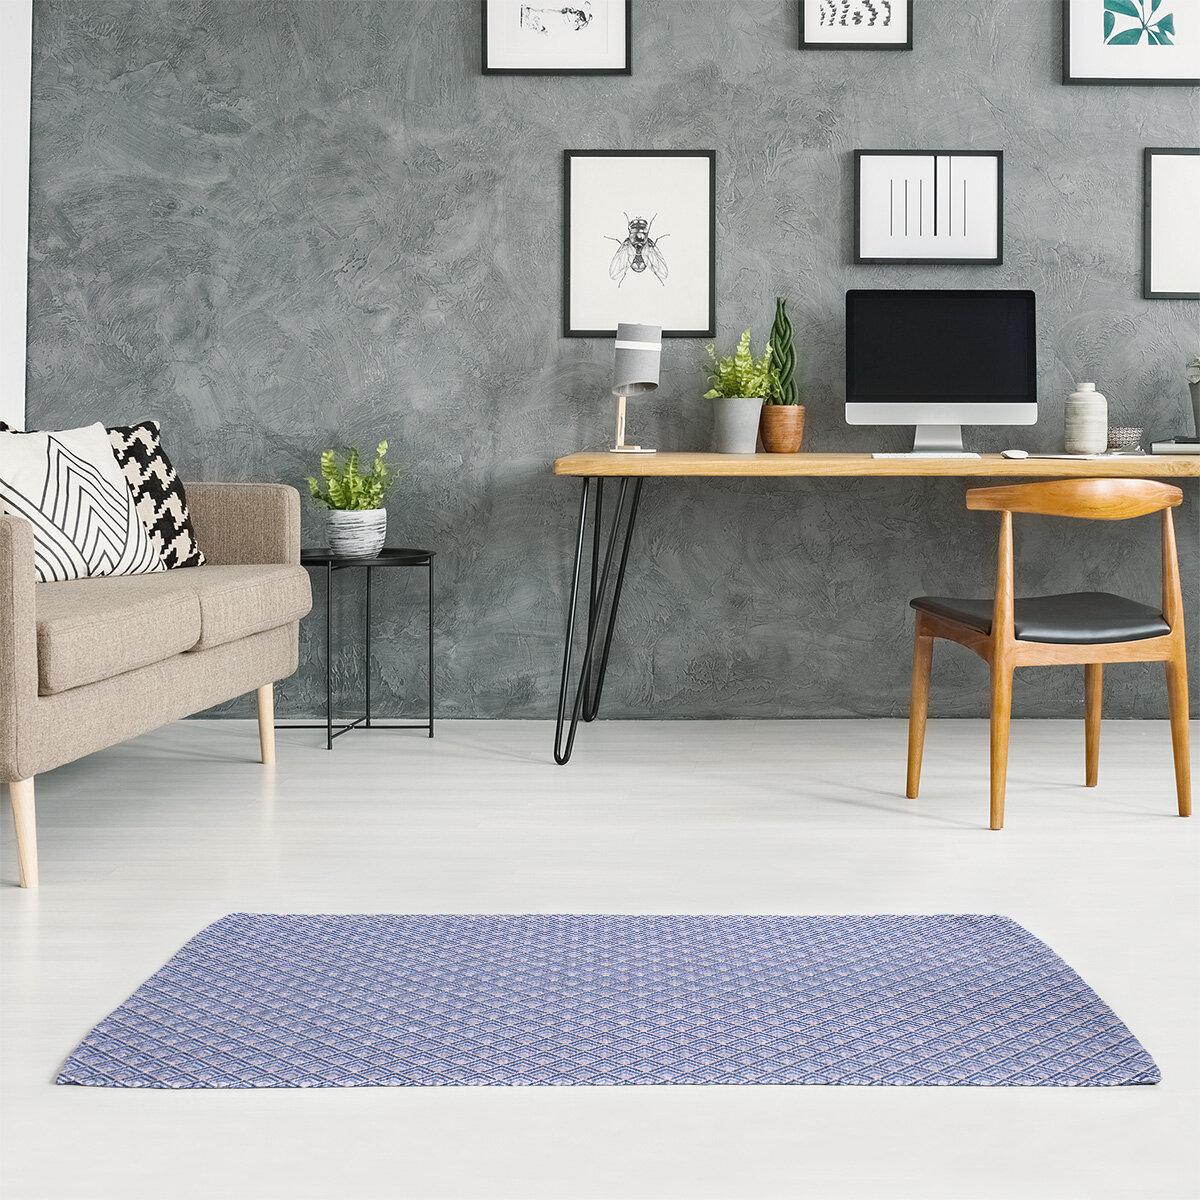 Multicolor Purple Area Rugs You Ll Love In 2021 Wayfair